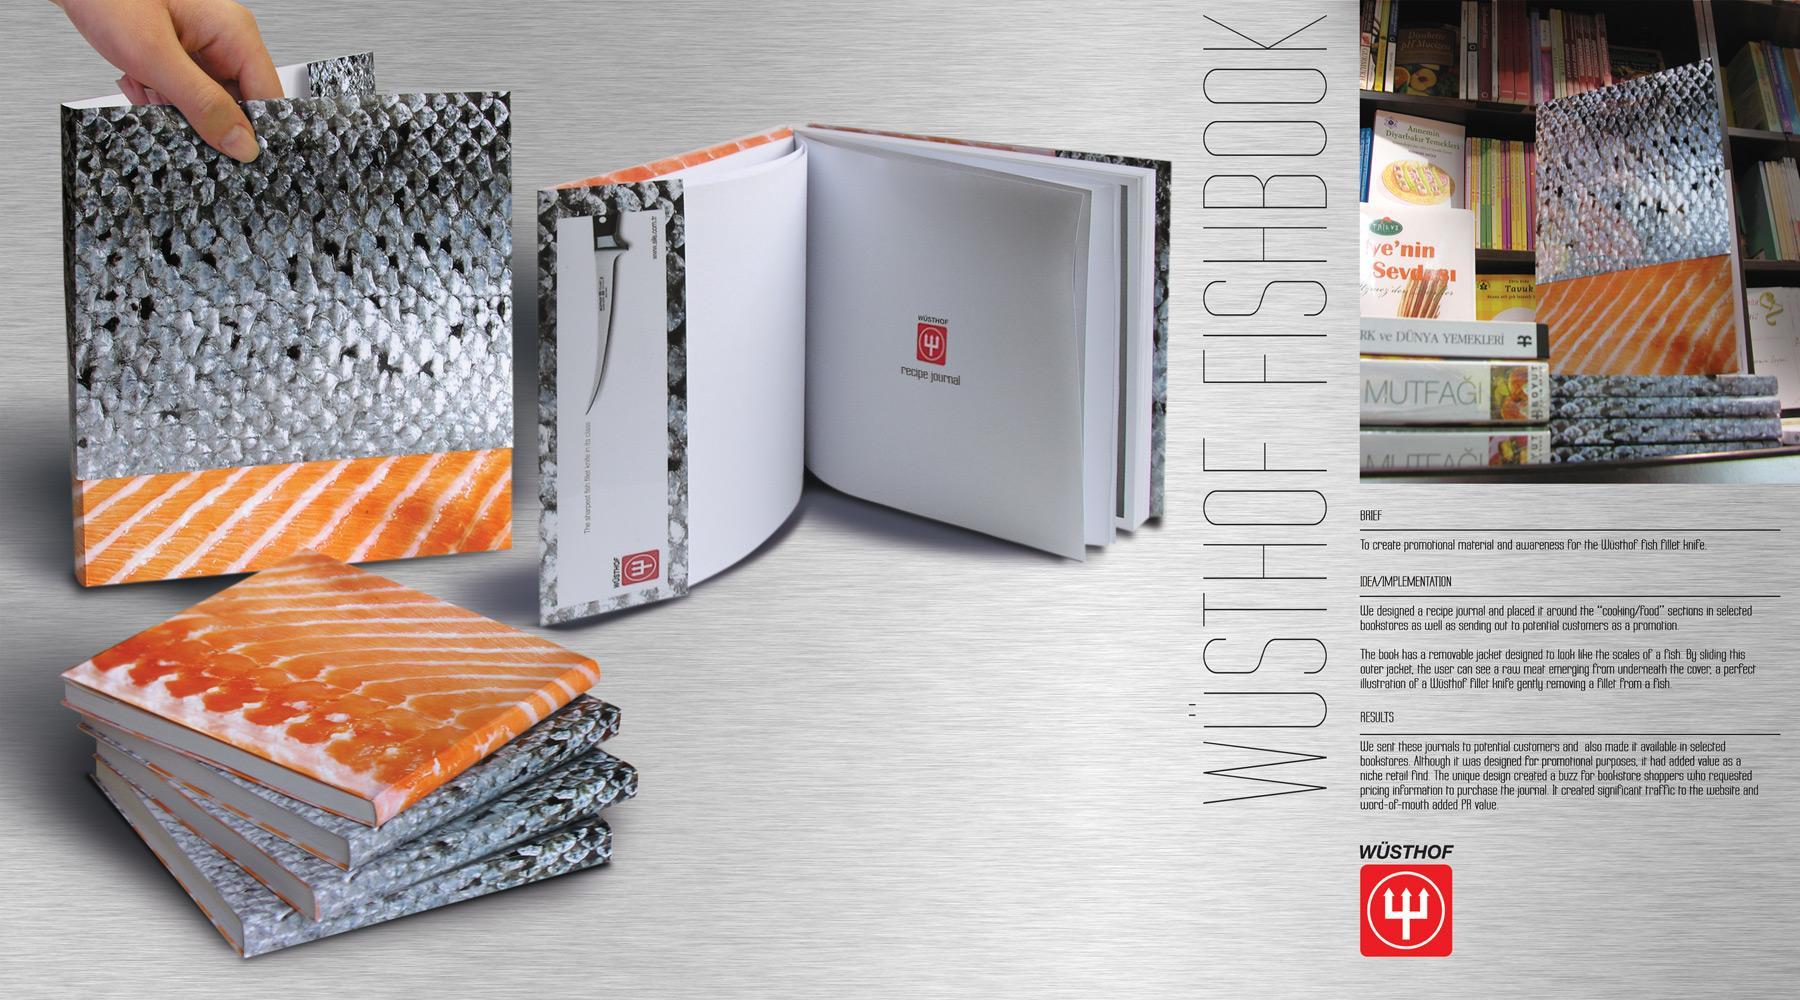 Wusthof Direct Ad -  Fishbook